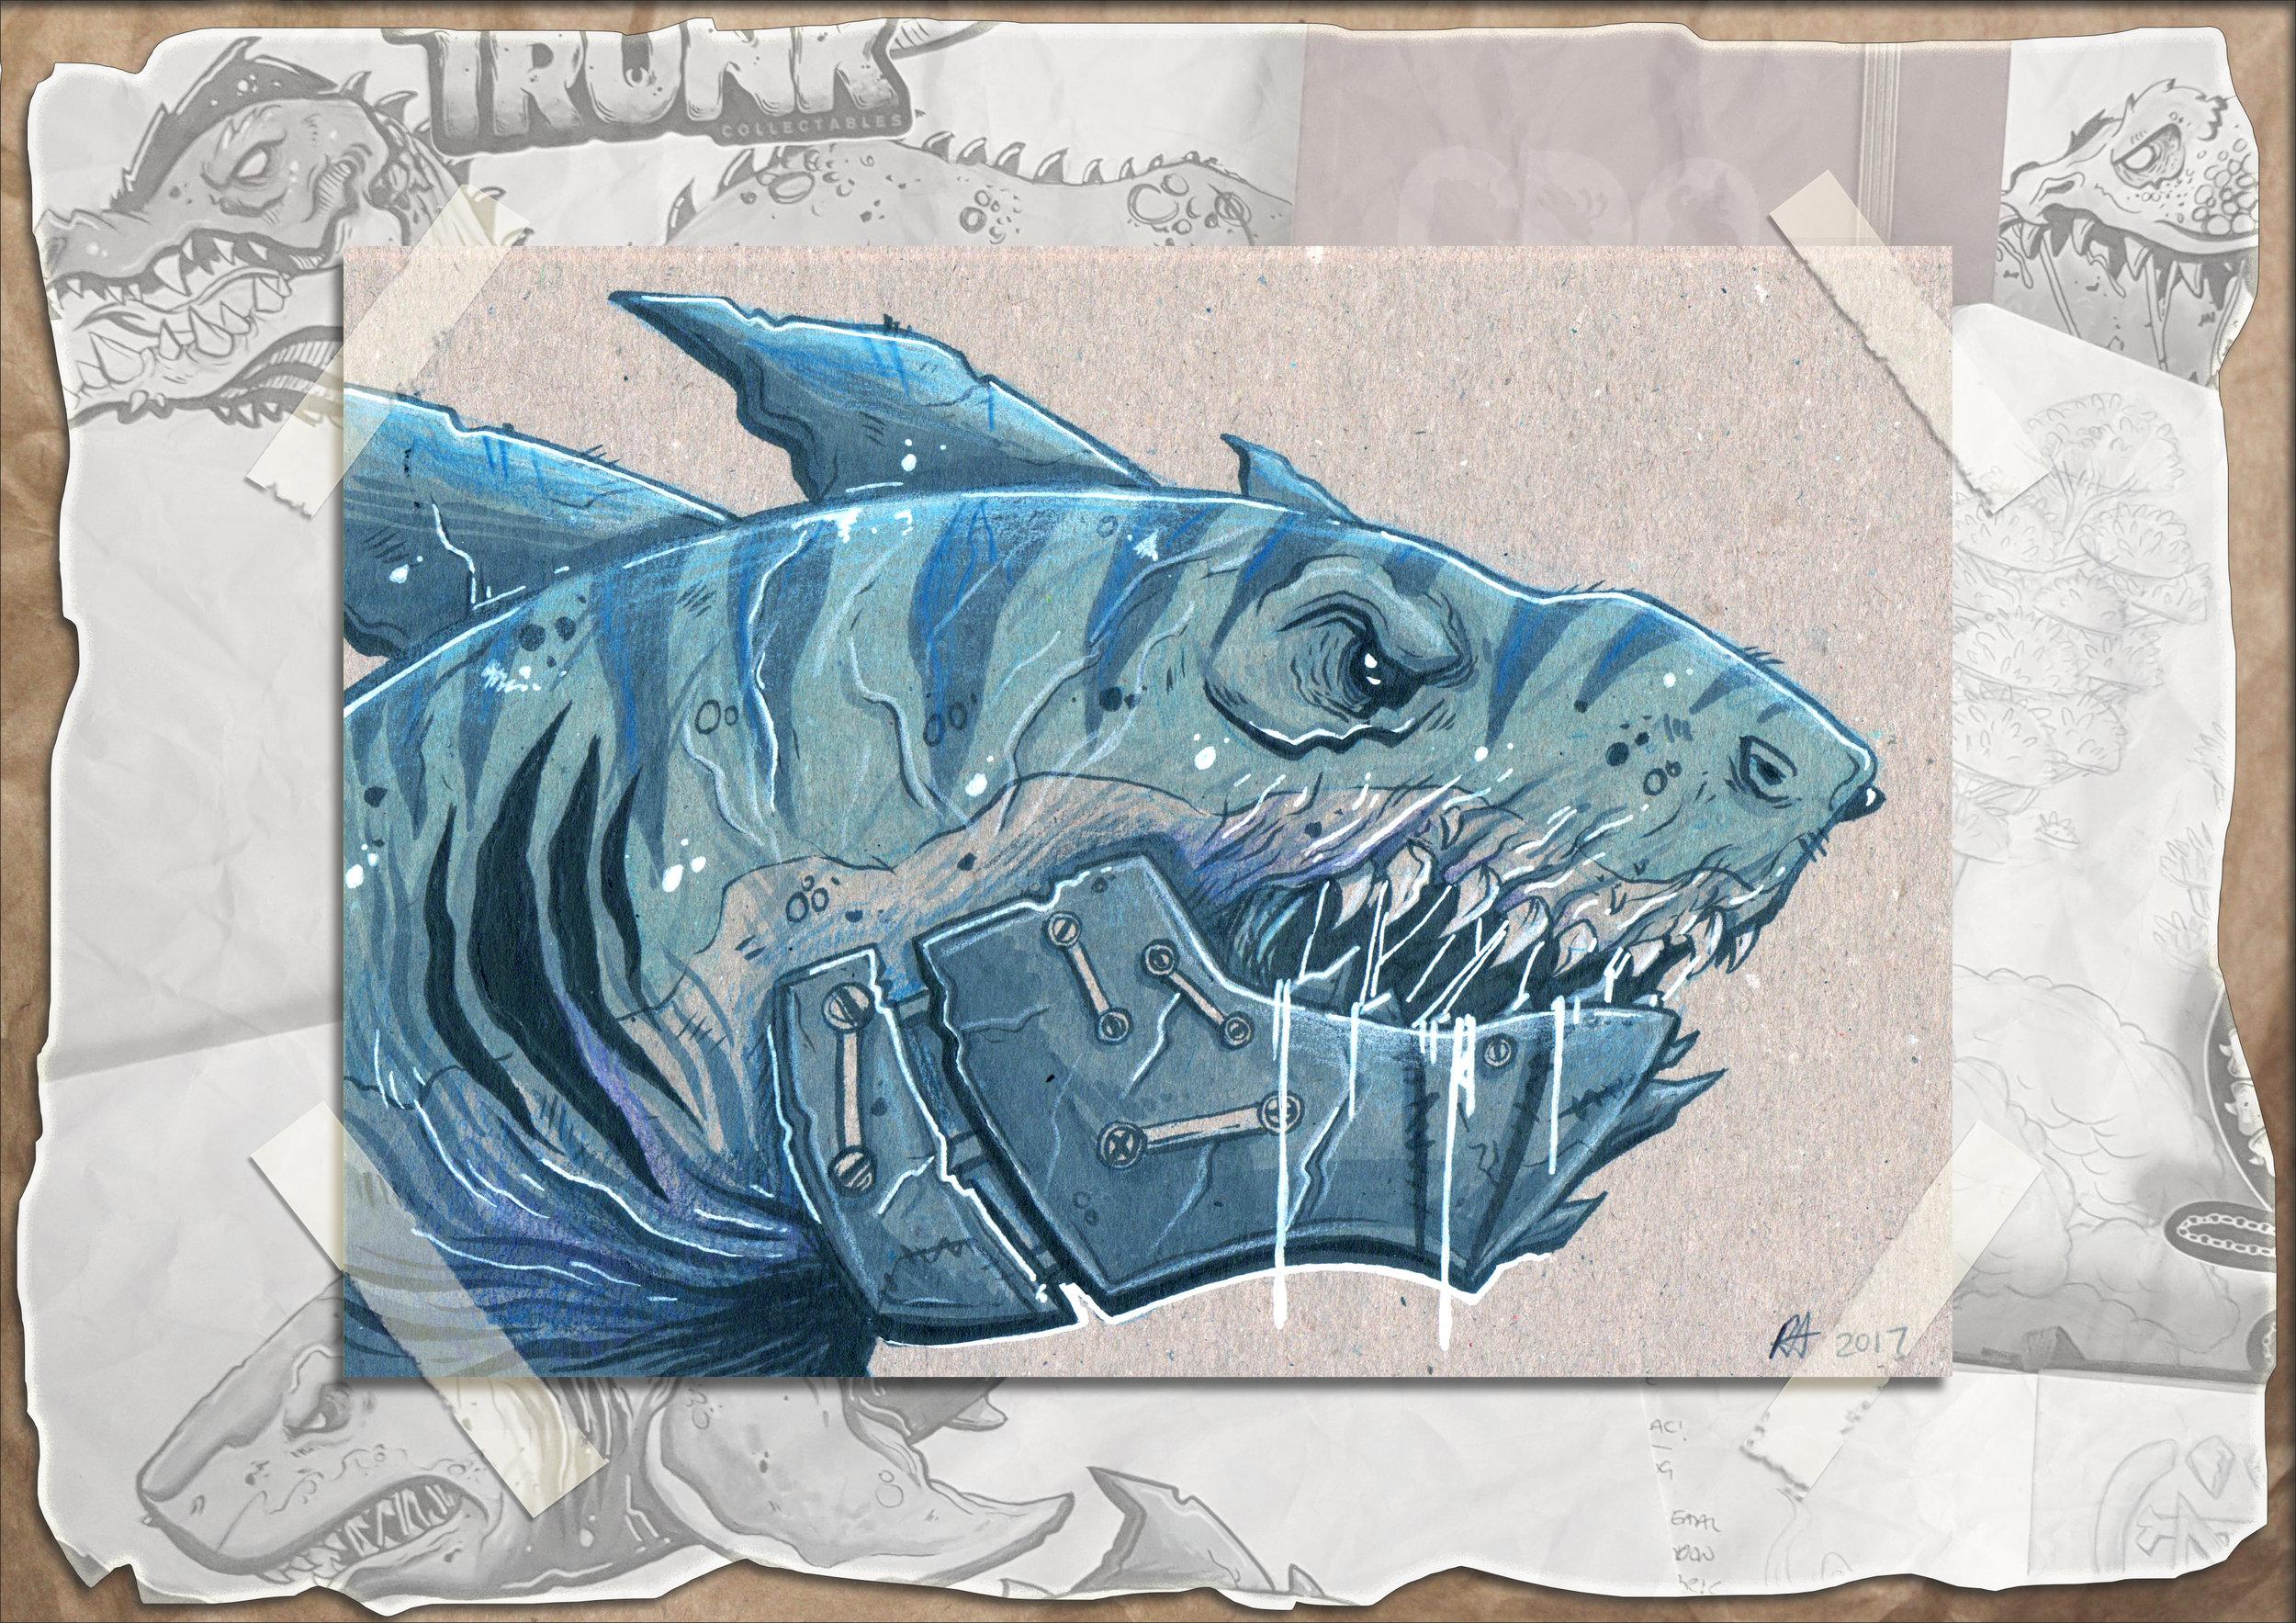 Mech_shark_card_sketch copy.jpg